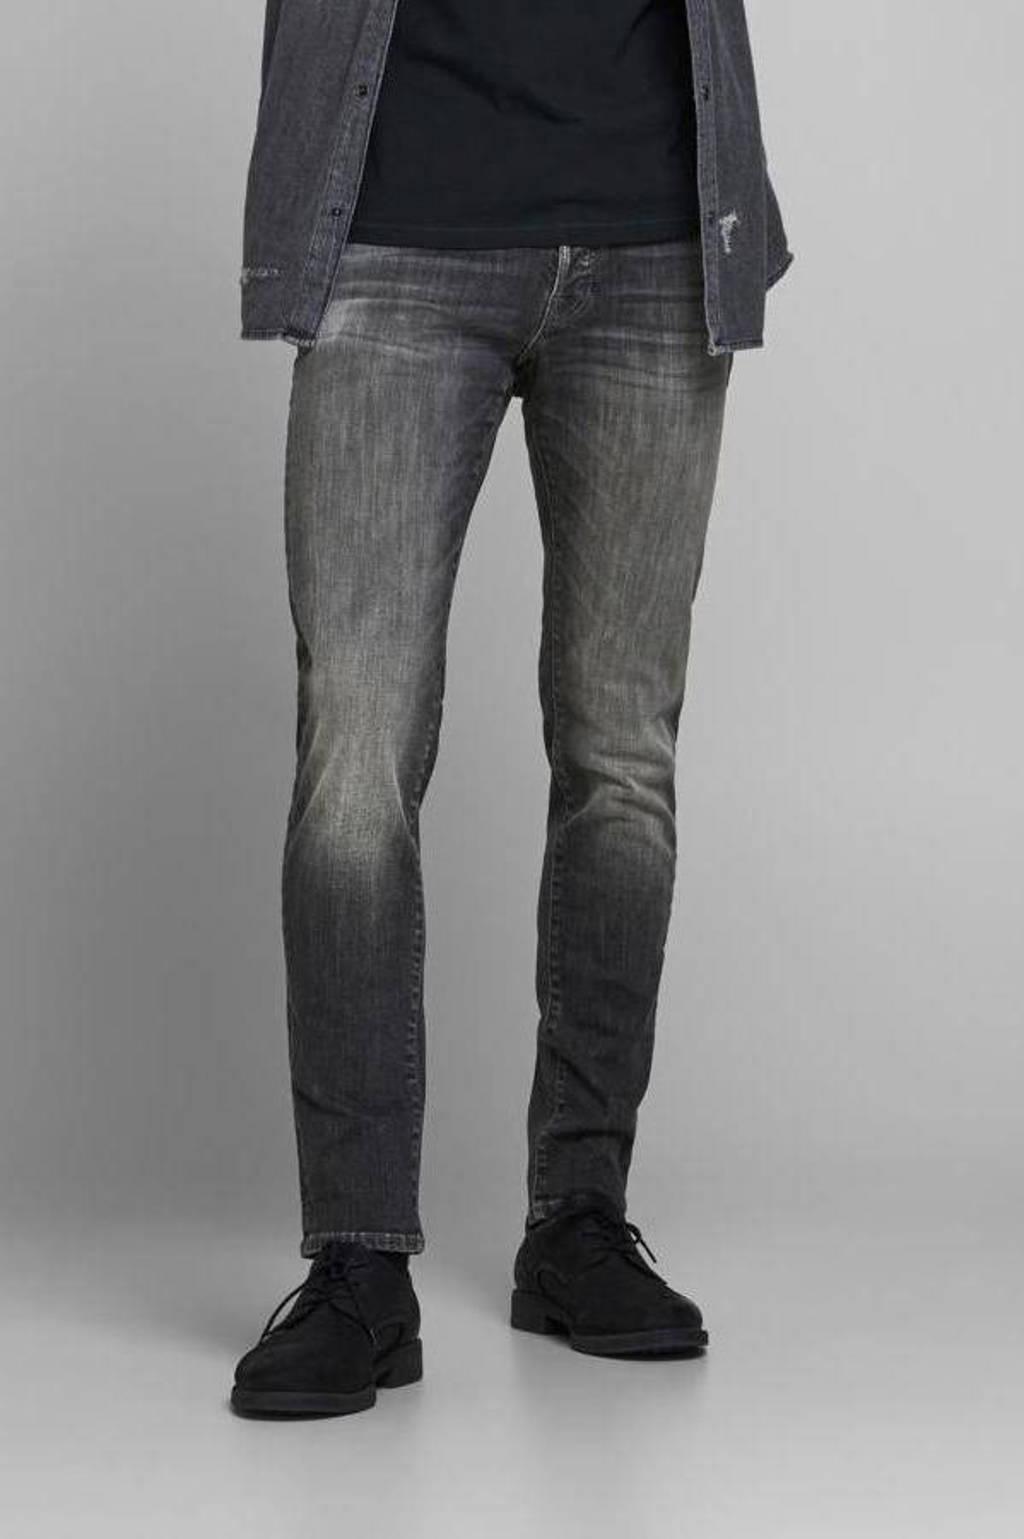 JACK & JONES JEANS INTELLIGENCE slim fit jeans JJIGLENN JJFOX met biologisch katoen zwart, Zwart